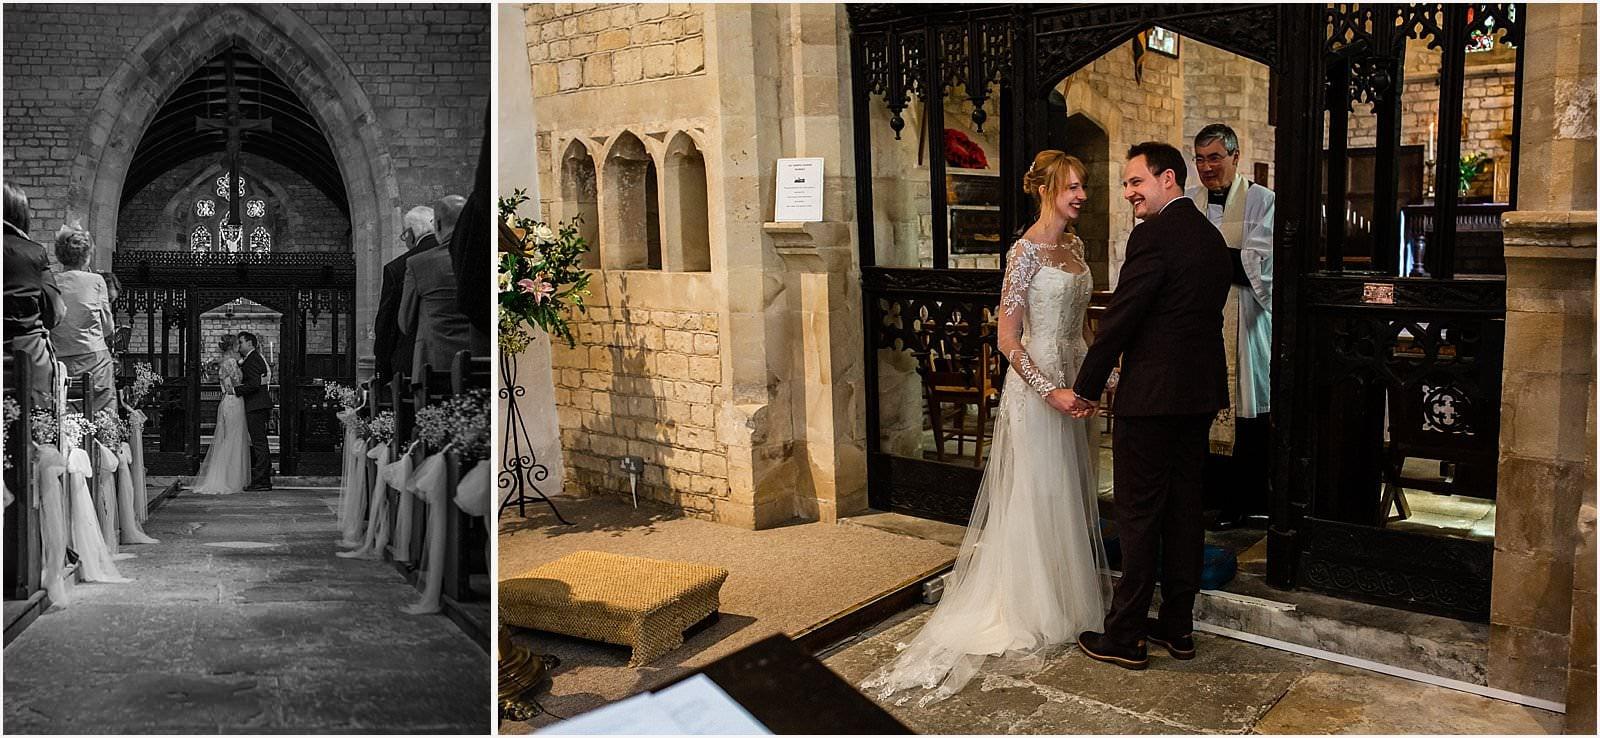 Breathtaking Nunney Castle, Somerset Wedding Photographer  - Sarah & Daniel 35